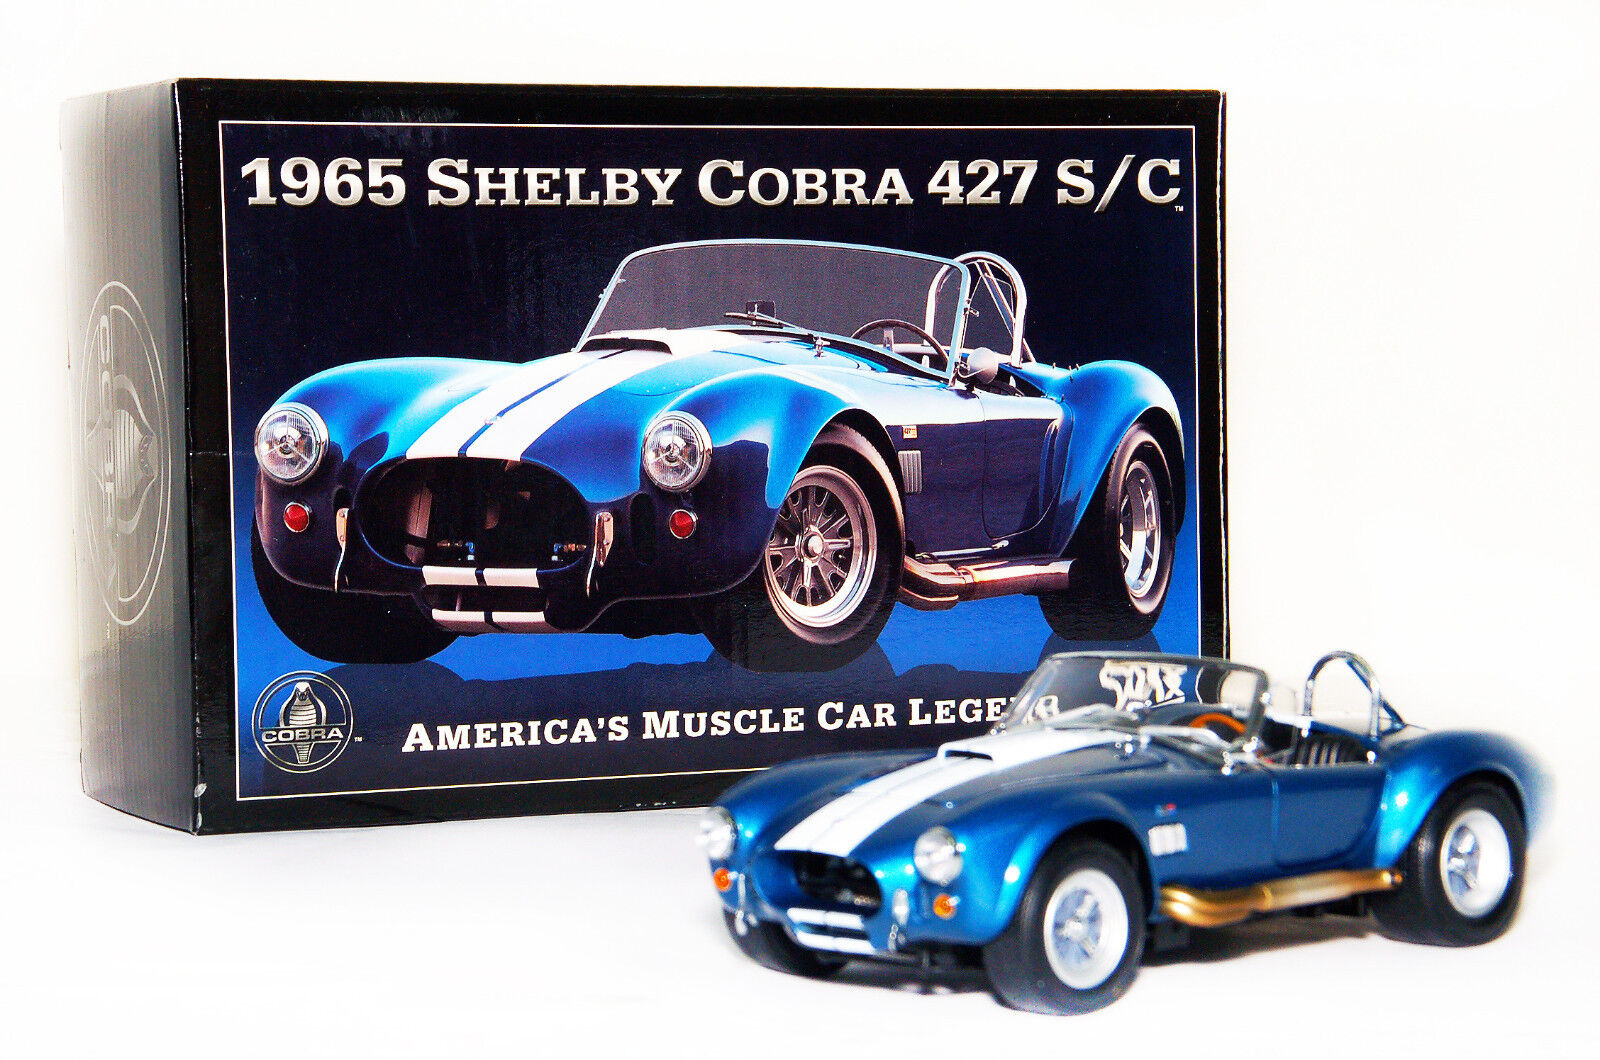 AUTHENTIC WIX CAR 1965 SHELBY COBRA 427 S/C | Diecast CraZy